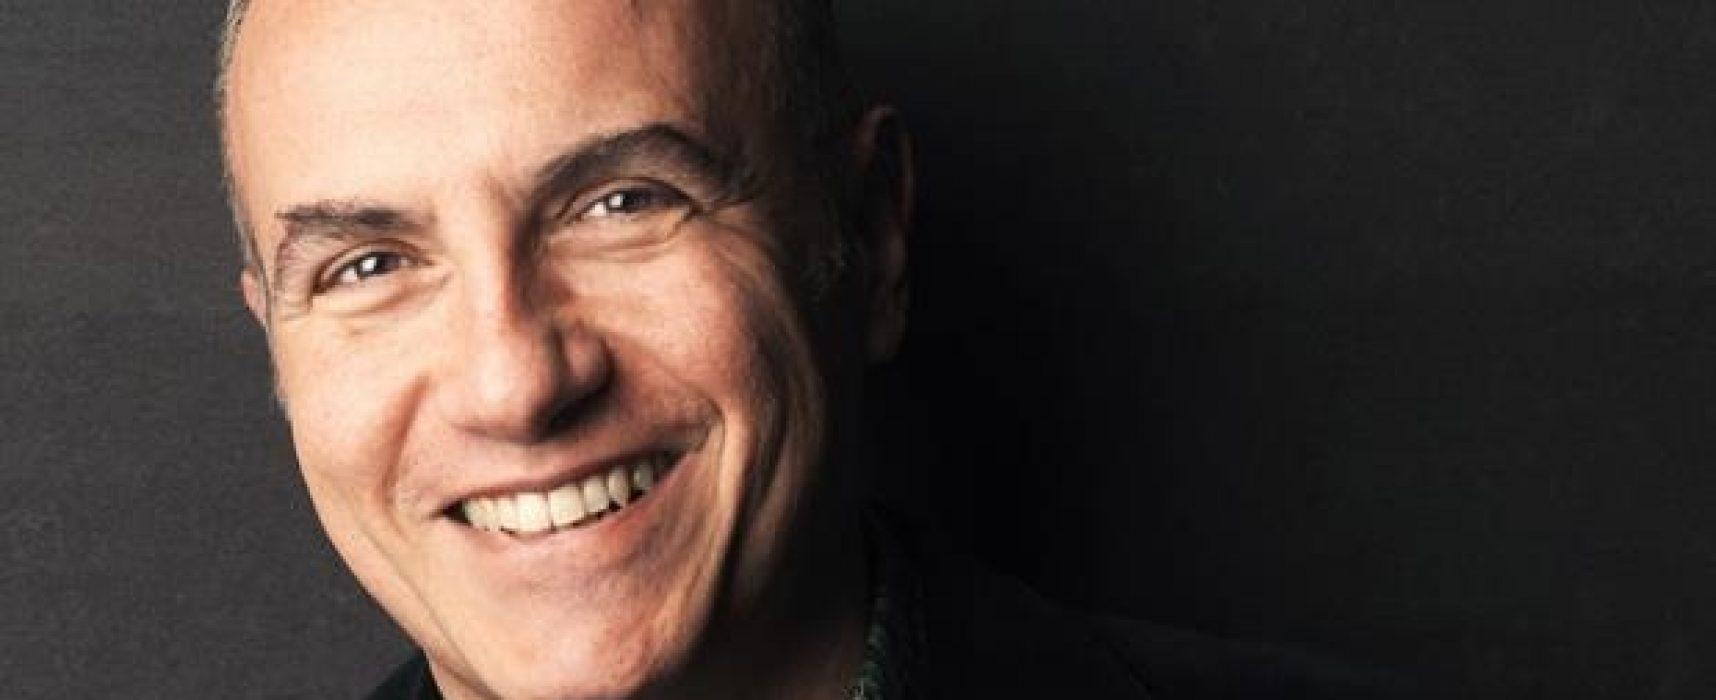 Oona Rea Band feat. Danilo Rea al Maschio Angioino